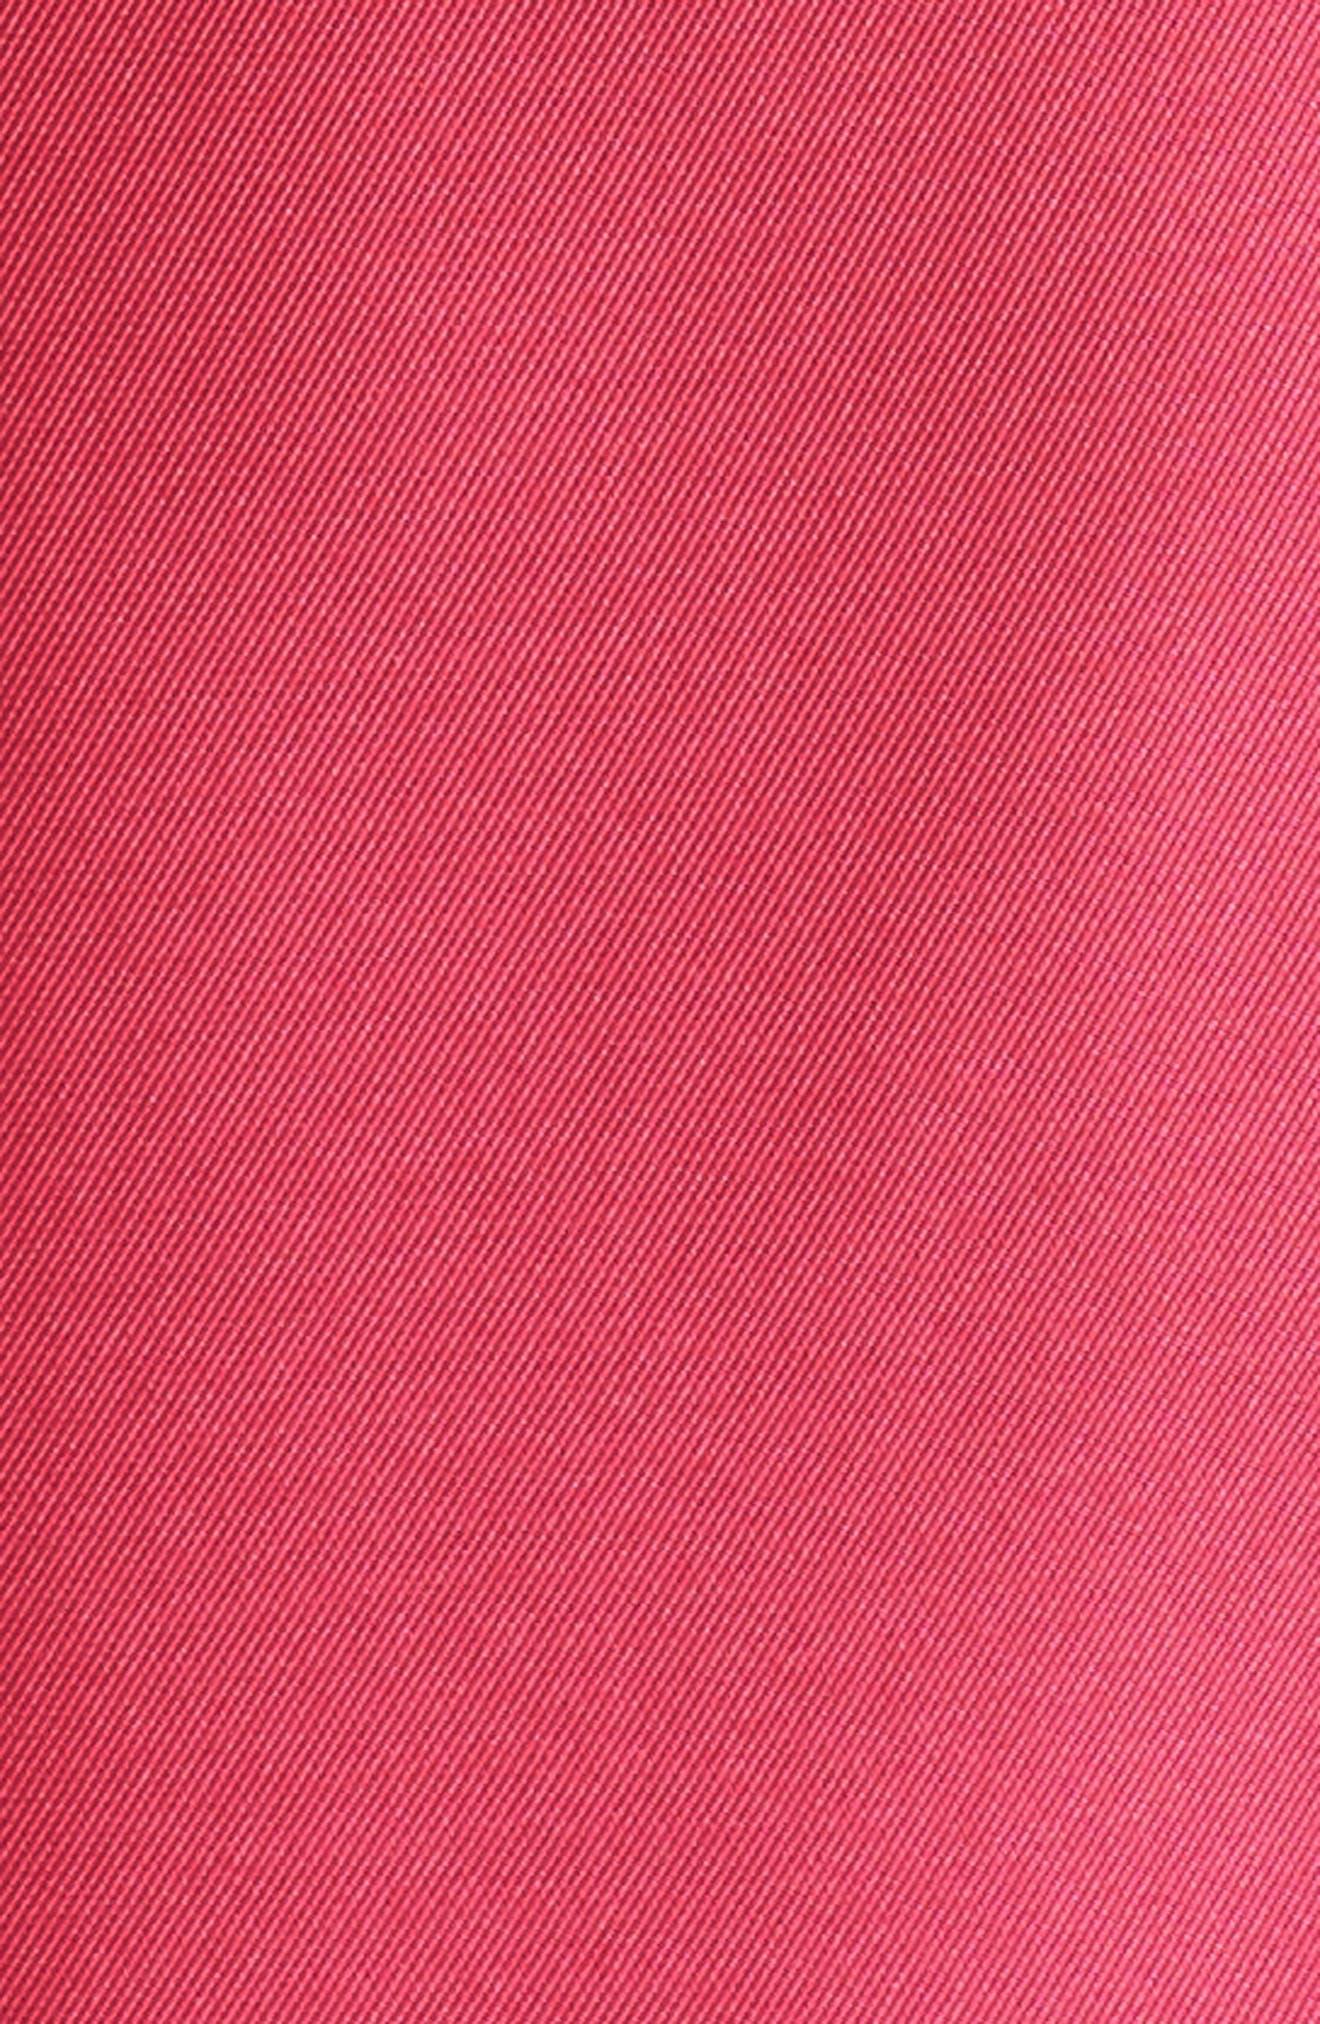 Strapless Mikado Gown,                             Alternate thumbnail 6, color,                             GERANIUM